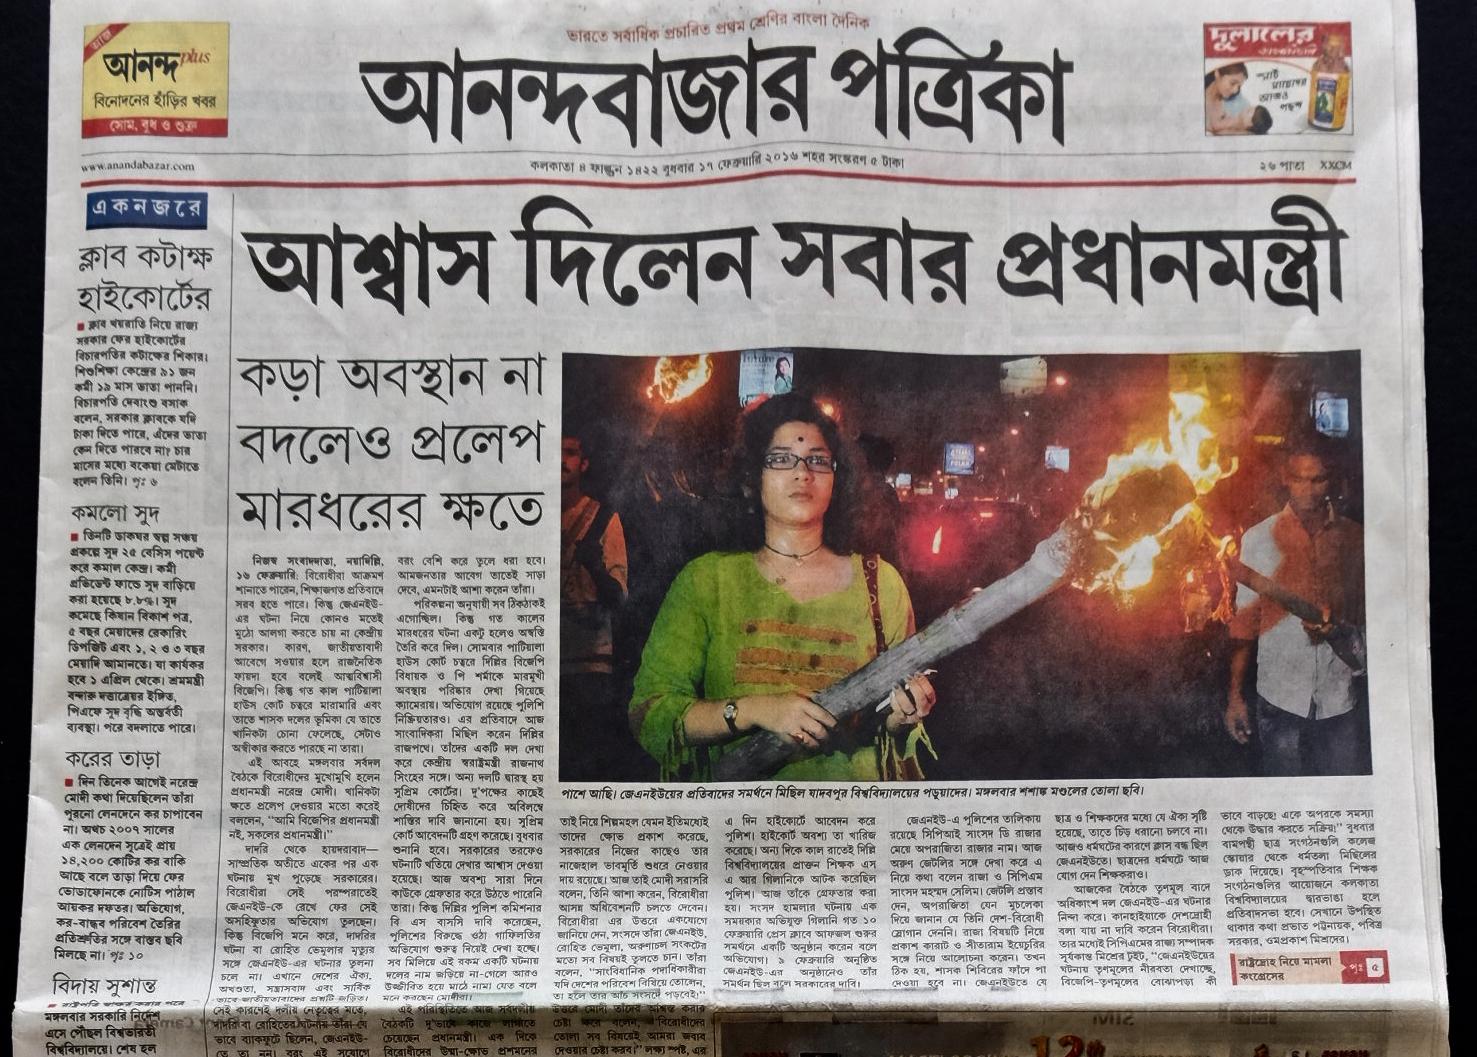 Bengali language newspaper